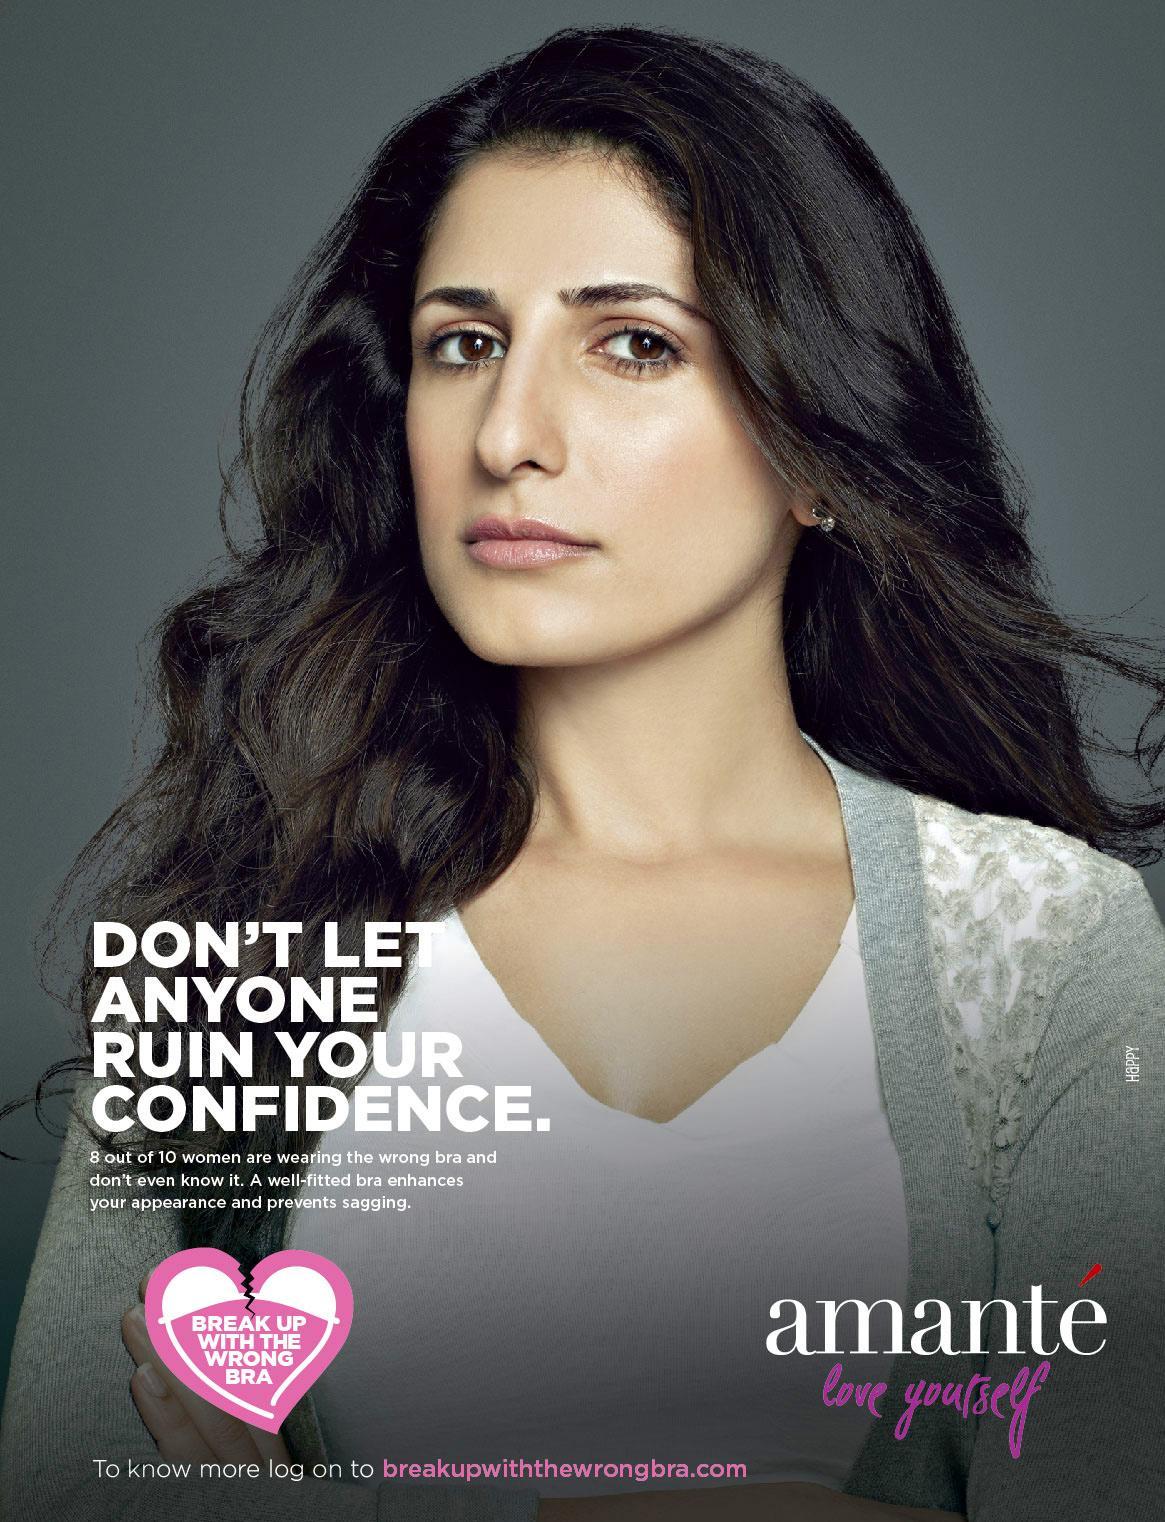 Amanté Print Ad -  Break up the wrong bra, 6